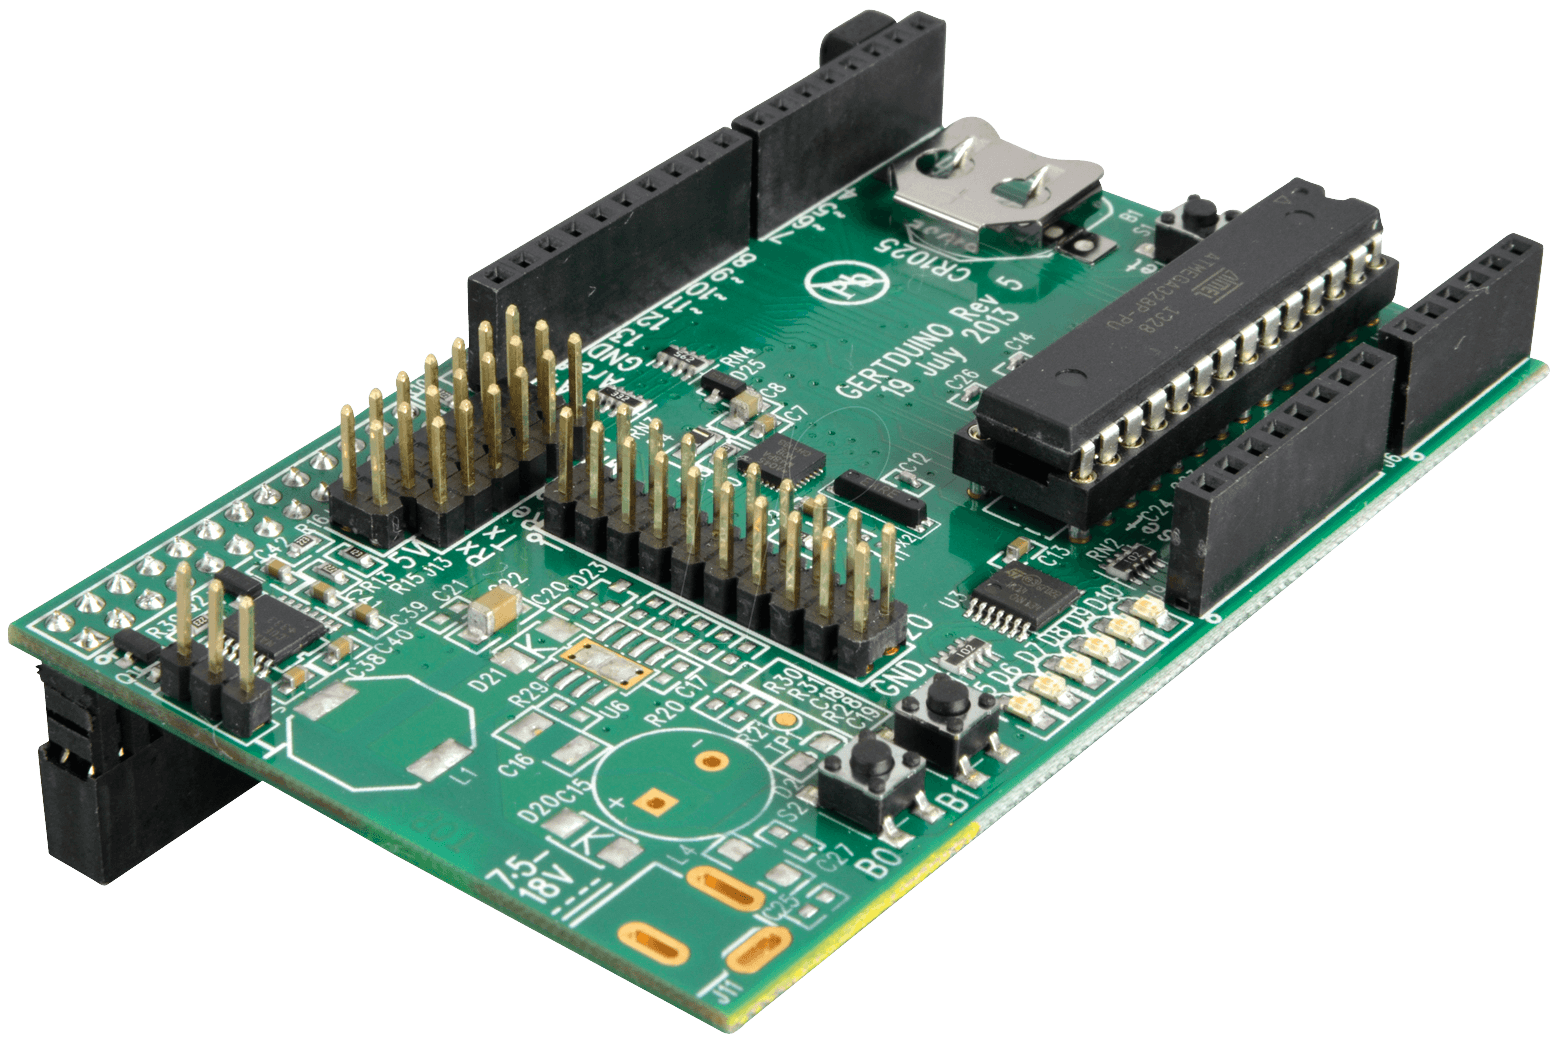 Rasp gertduino rpi expansion arduino compatible at